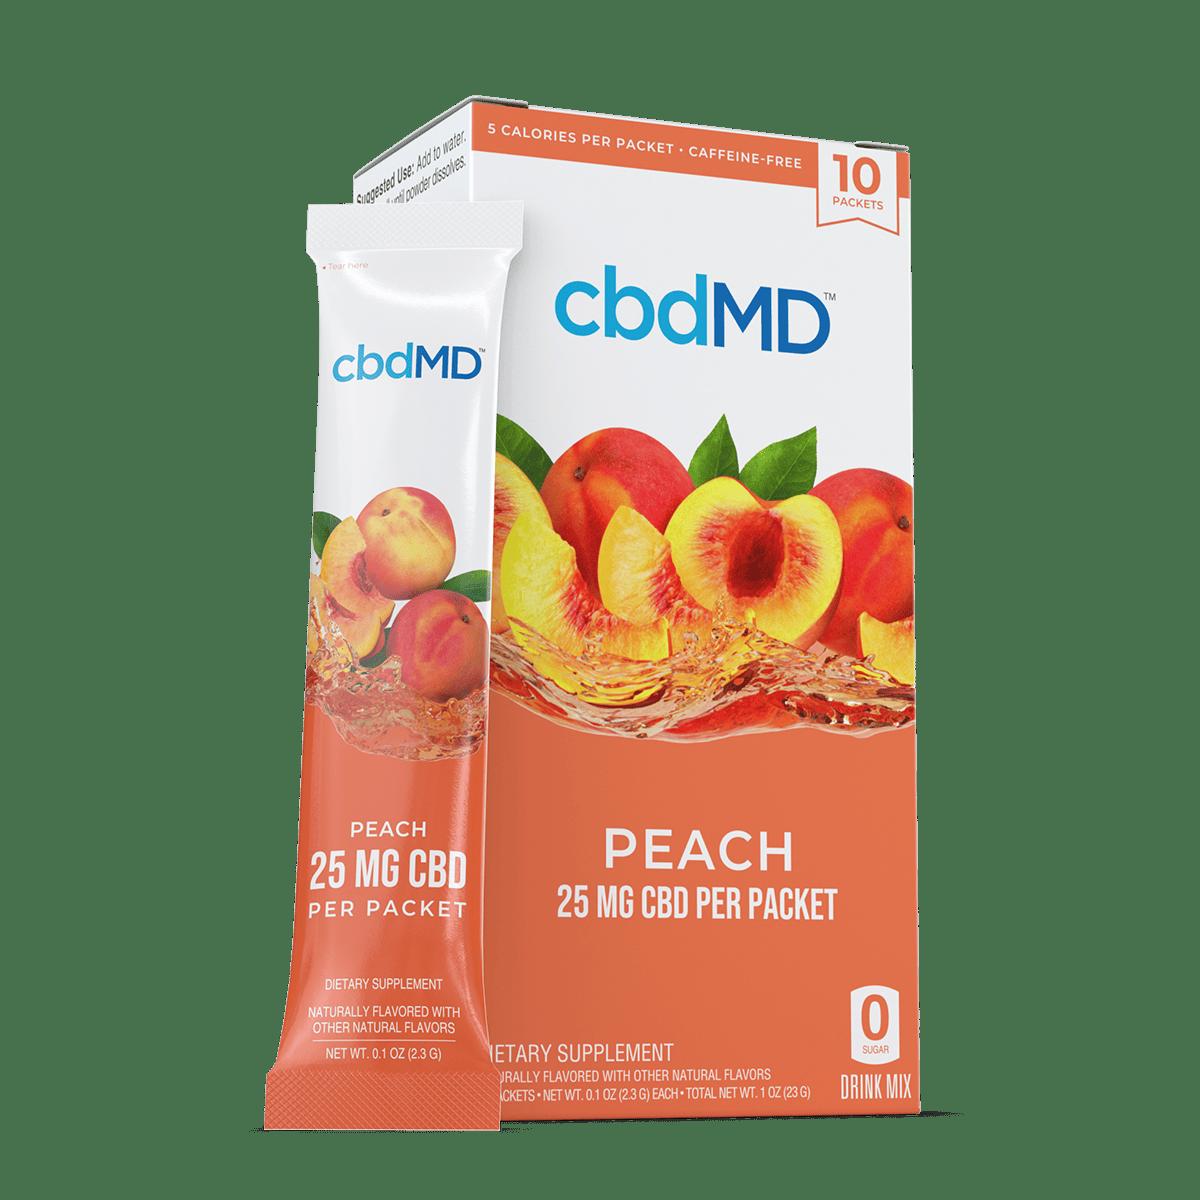 cbdMD, CBD Powdered Drink Mix, Broad Spectrum THC-Free, Peach, 10ct, 250mg CBD 1